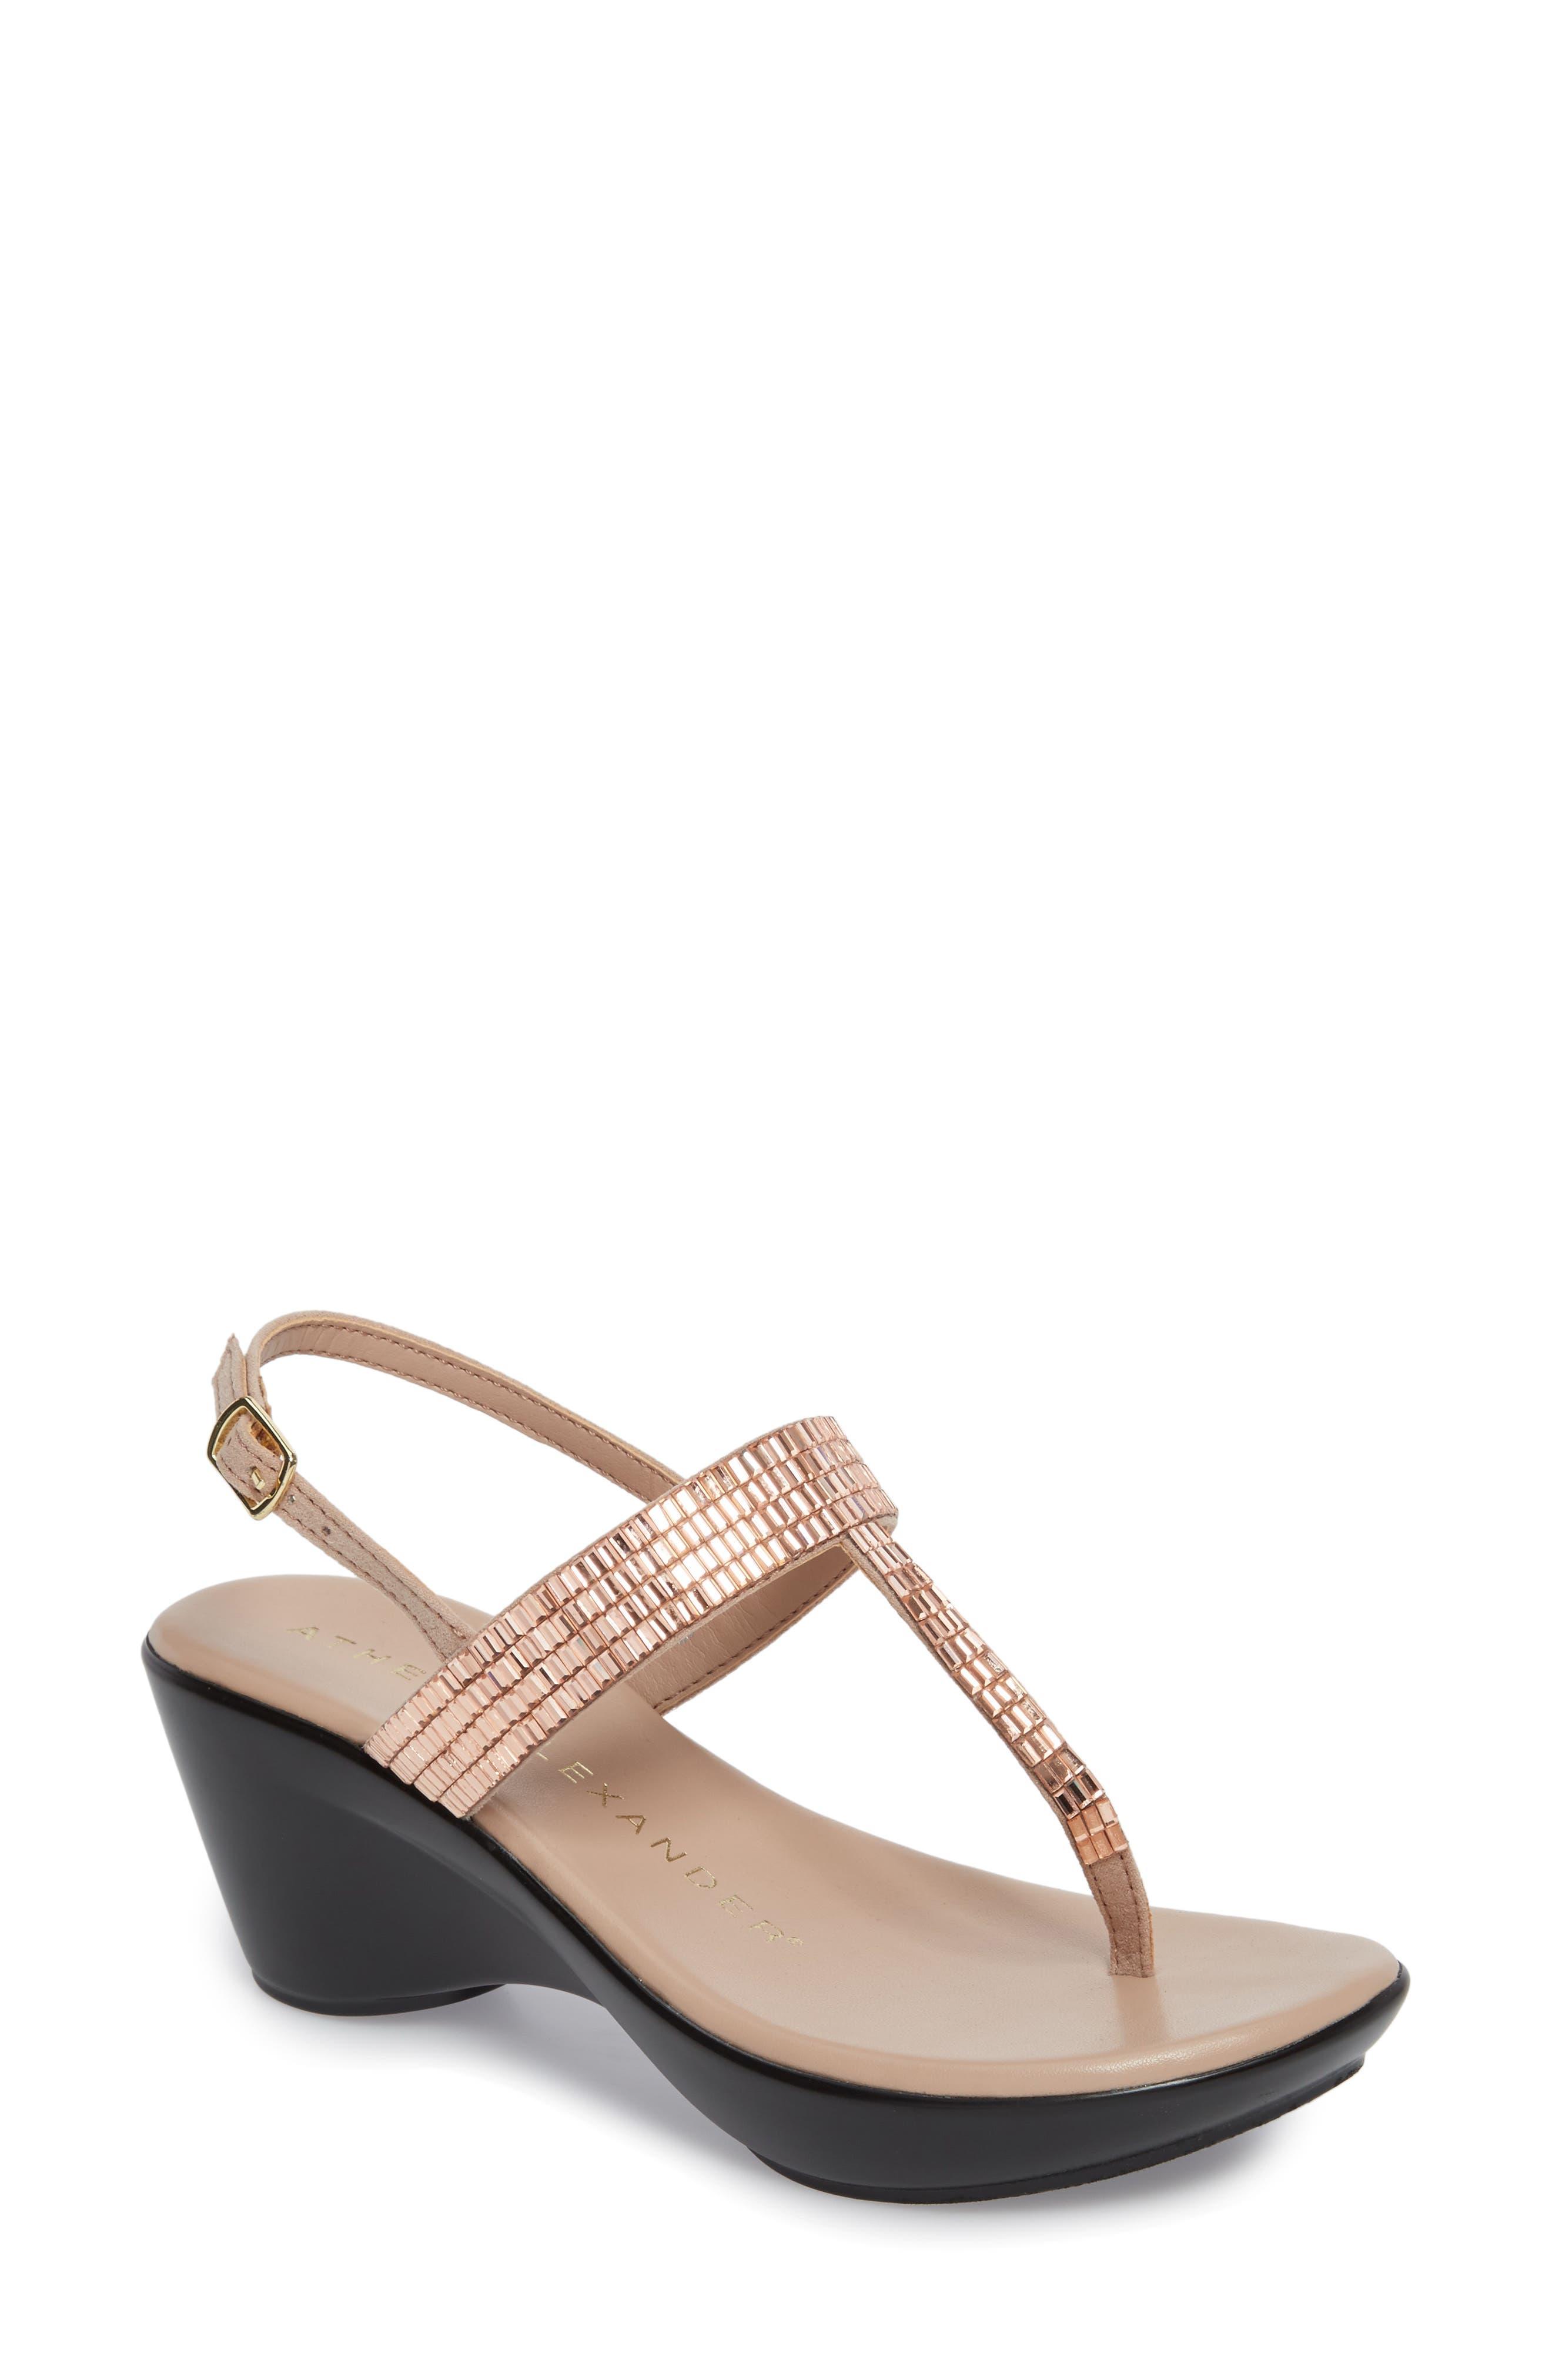 Alternate Image 1 Selected - Athena Alexander Dakkota Wedge Sandal (Women)